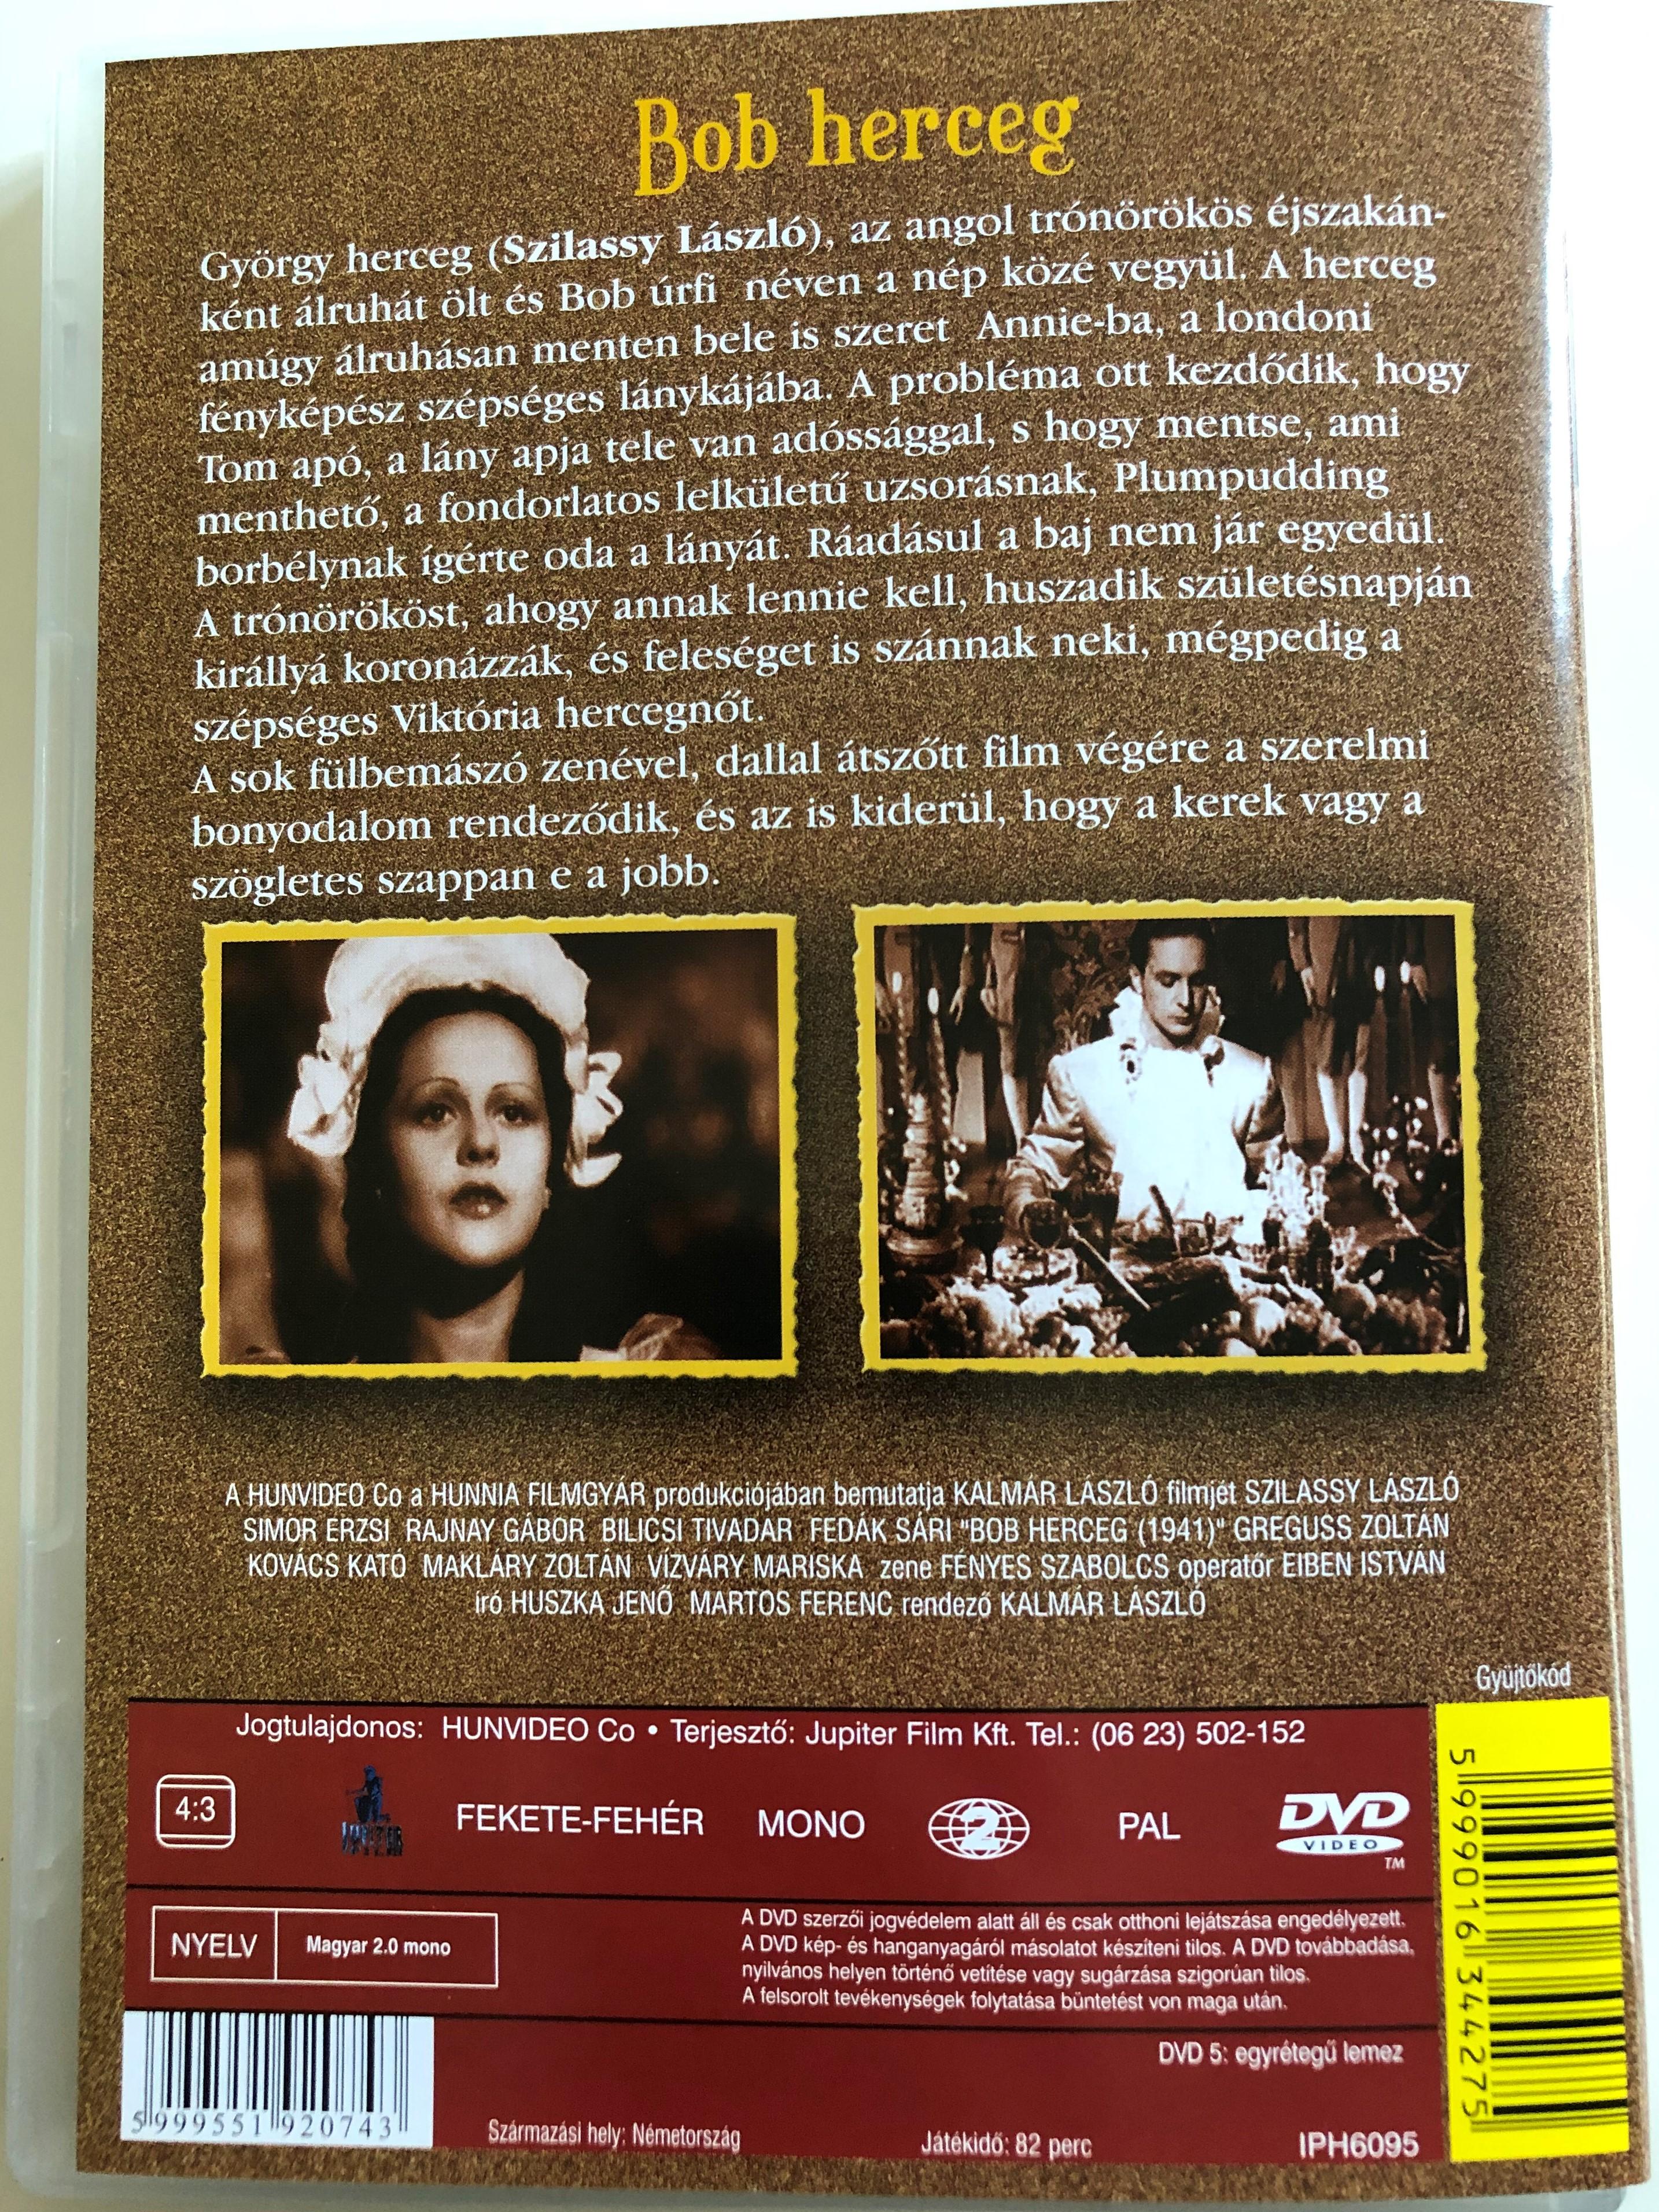 bob-herceg-dvd-1941-prince-bob-directed-by-kalm-r-l-szl-starring-szilassy-l-szl-simor-erzsi-greguss-zolt-n-makl-ry-zolt-n-bilicsi-tivadar-rajnai-g-bor-hungarian-classics-27.-2-.jpg